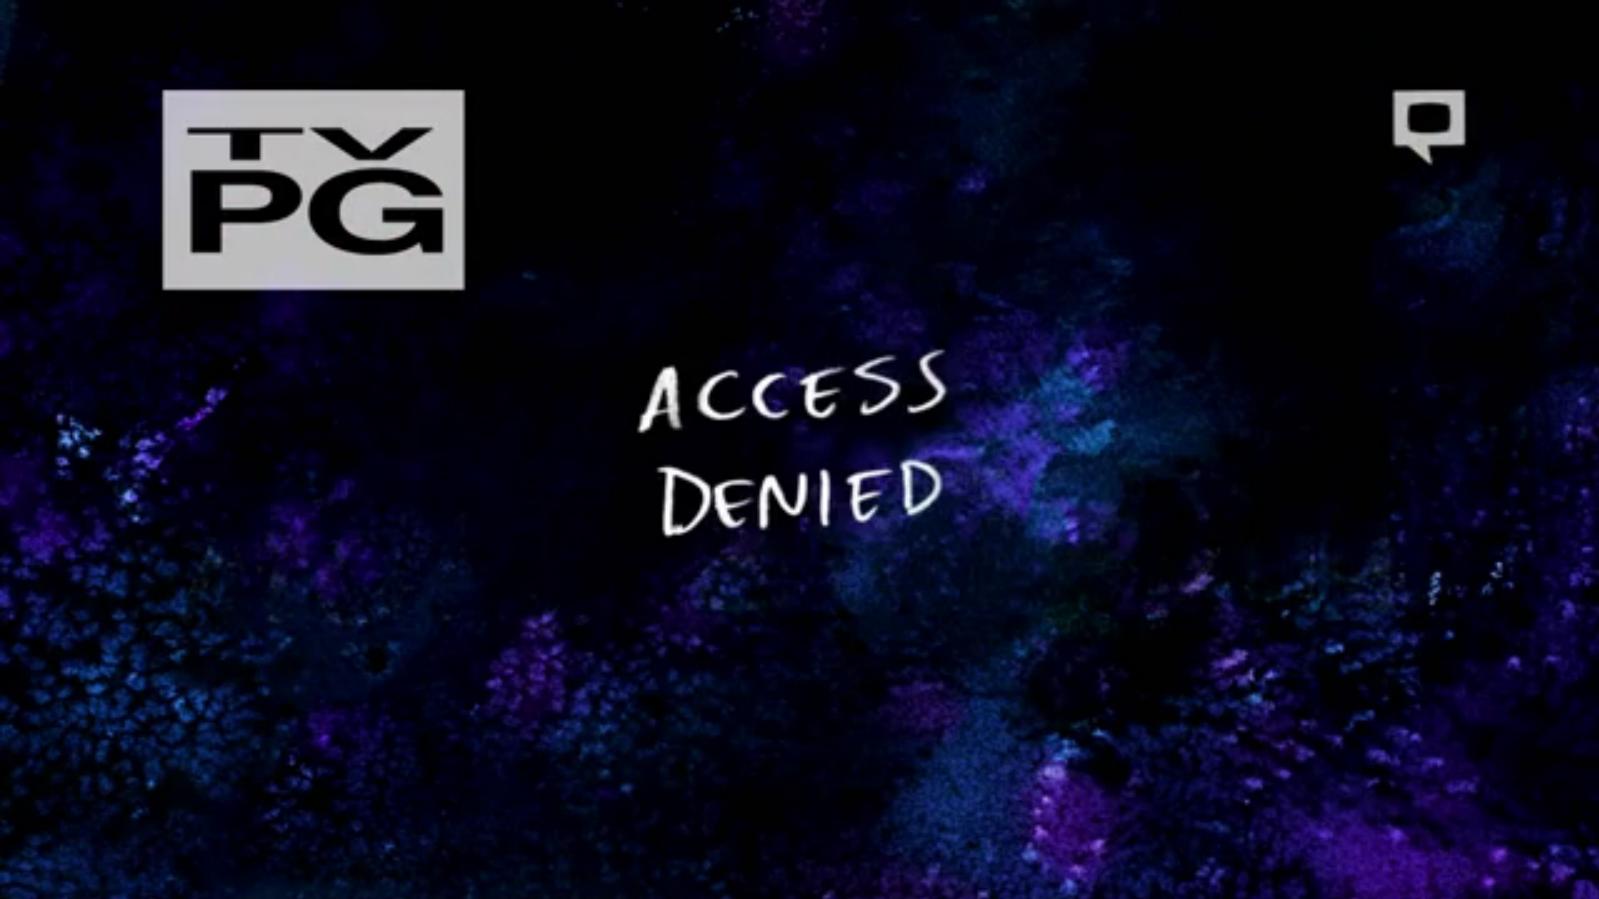 Access denied swlb-403 жж - baf5c